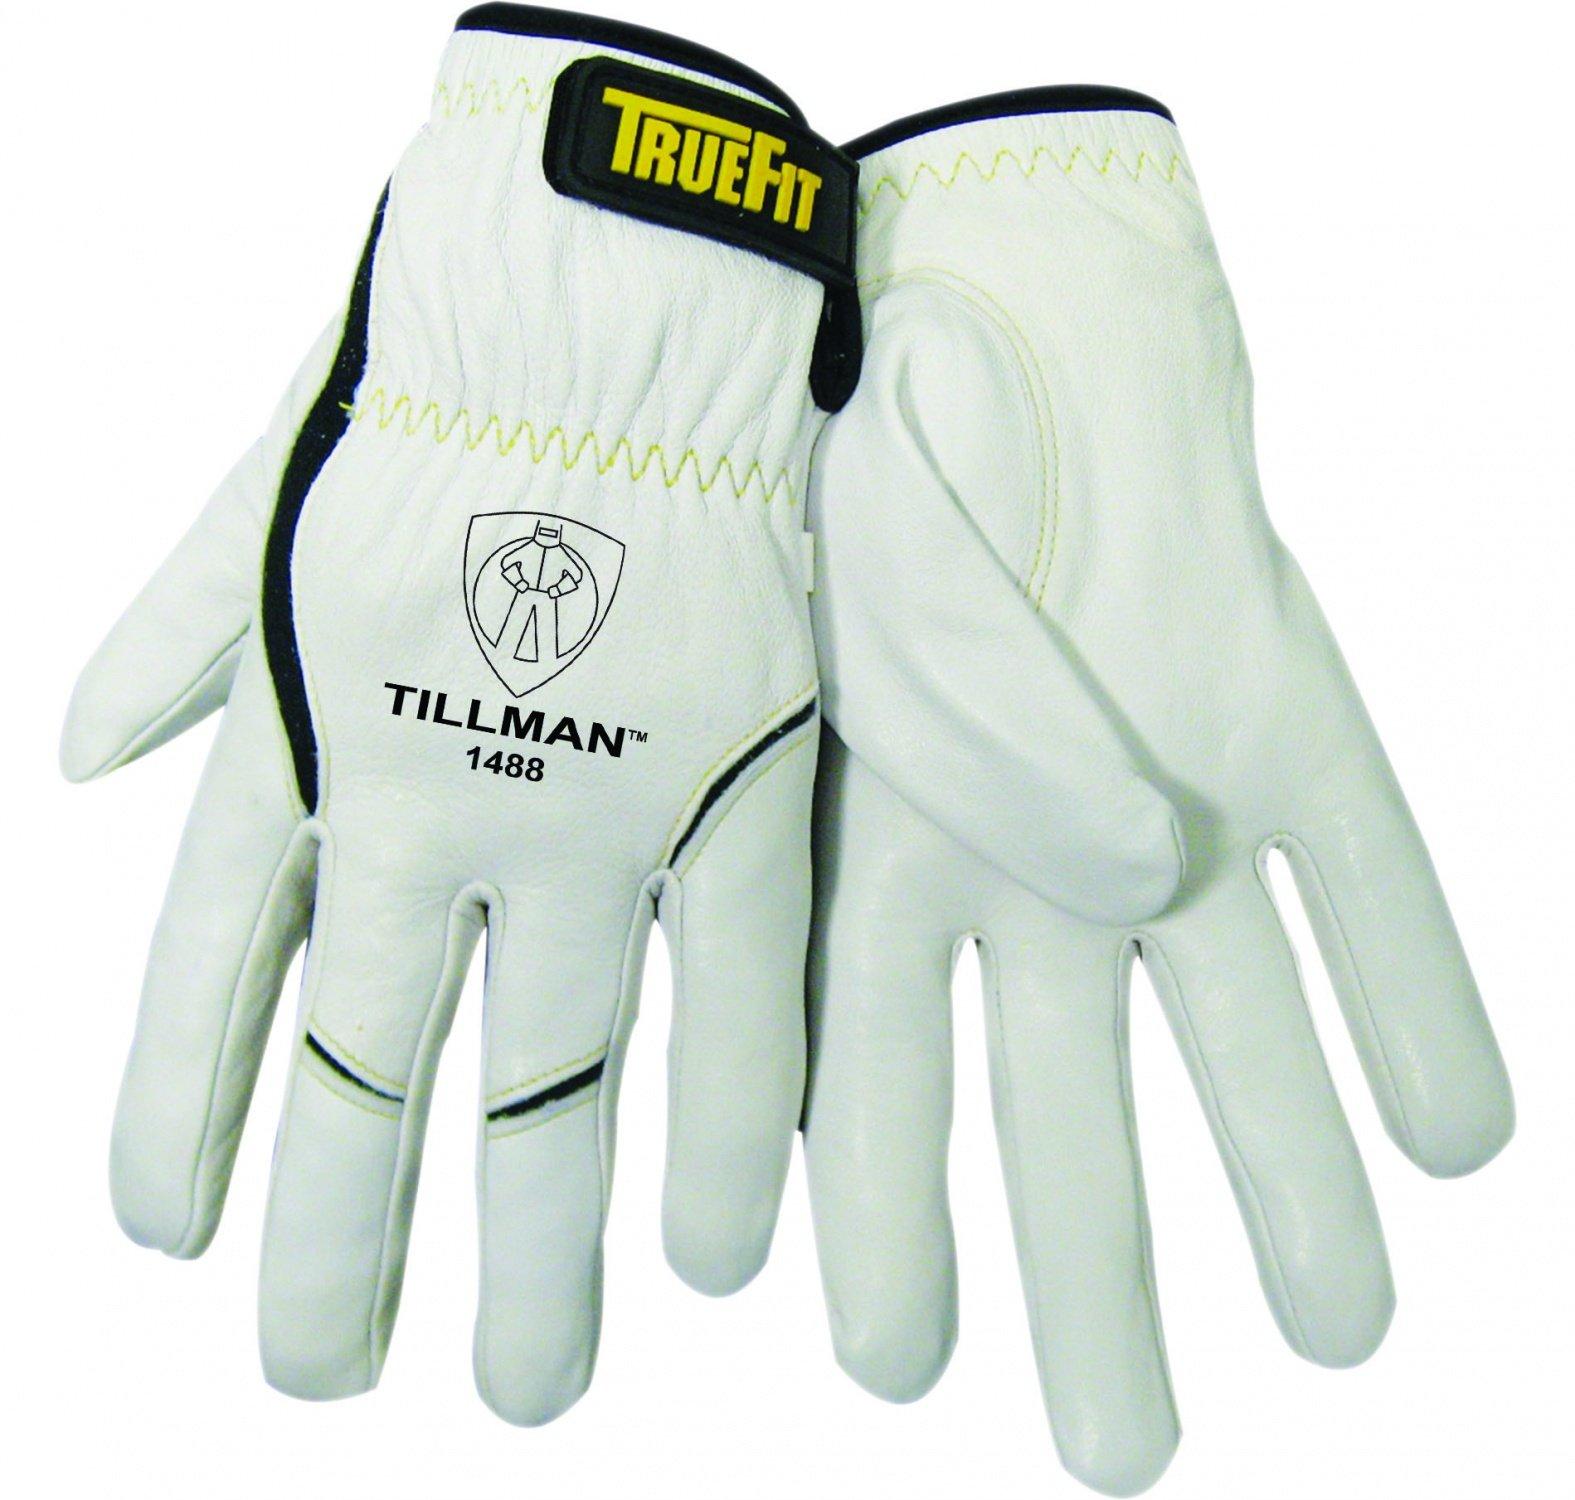 John Tillman 1488 L True Fit Large Top Grain Kevlar/Goatskin Super Premium Grade TIG Welders' Glove with Elastic Cuff, V Design Thumb/Hook/Loop Closure, English, 15.34 fl. oz, Plastic, 1 x 7.5 x 5 by John Tillman